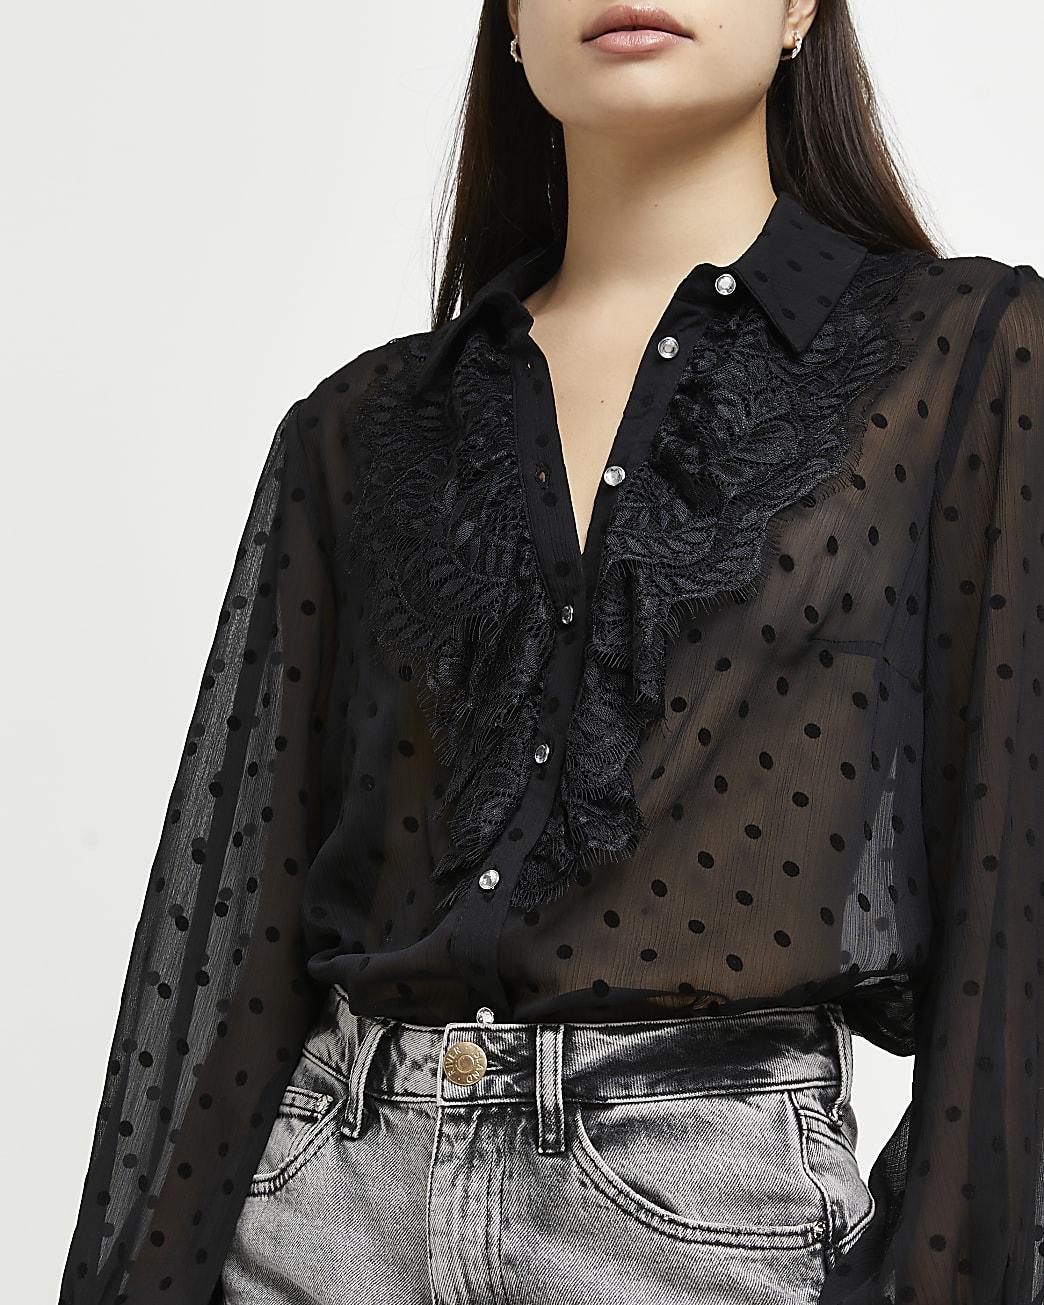 Black polka dot ruffled shirt